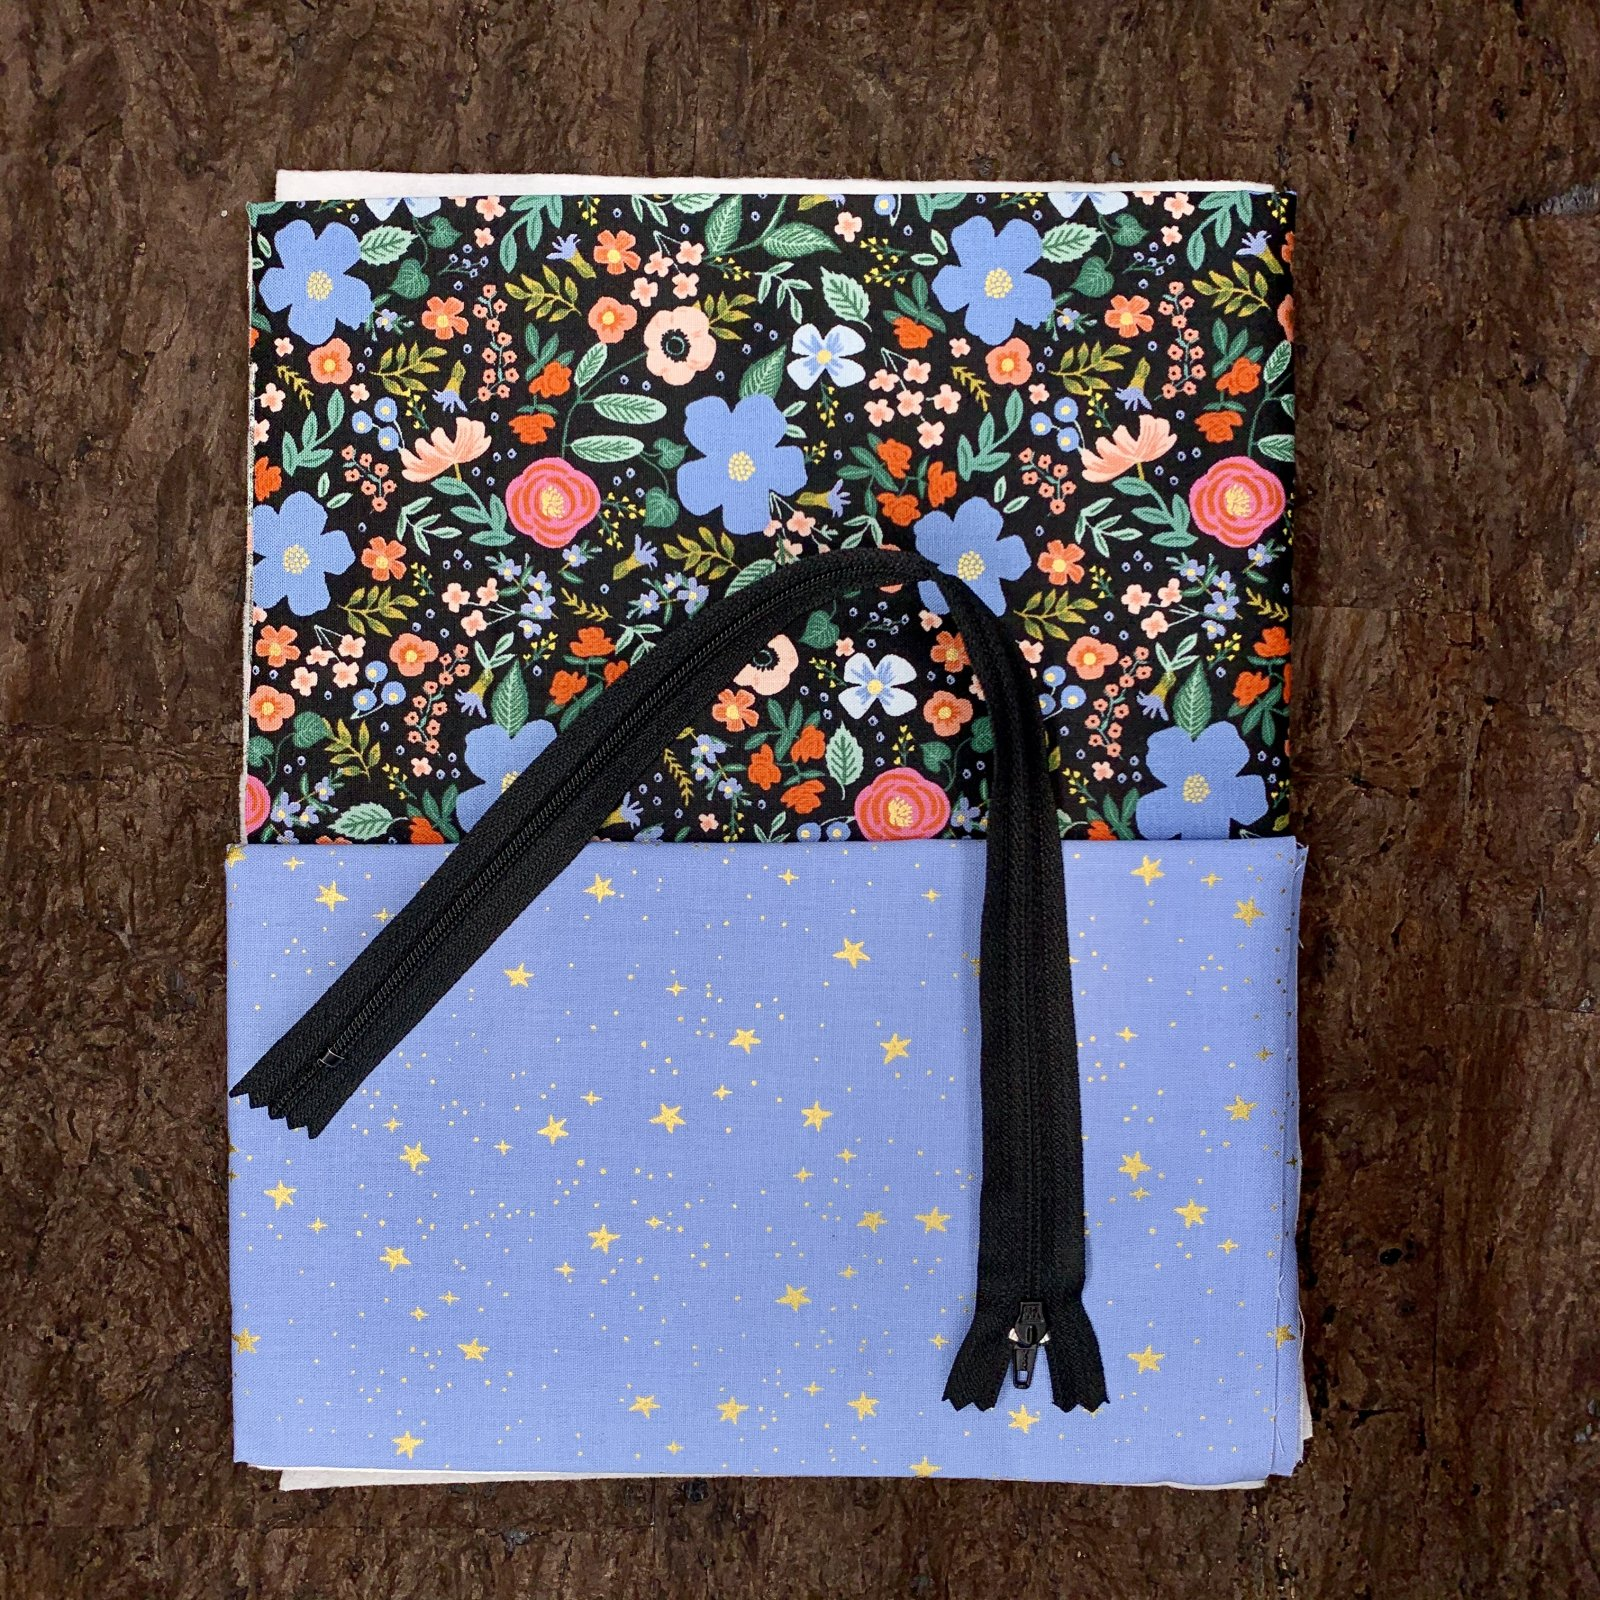 Stitch Box Bag Kit - Periwinkle Meadow